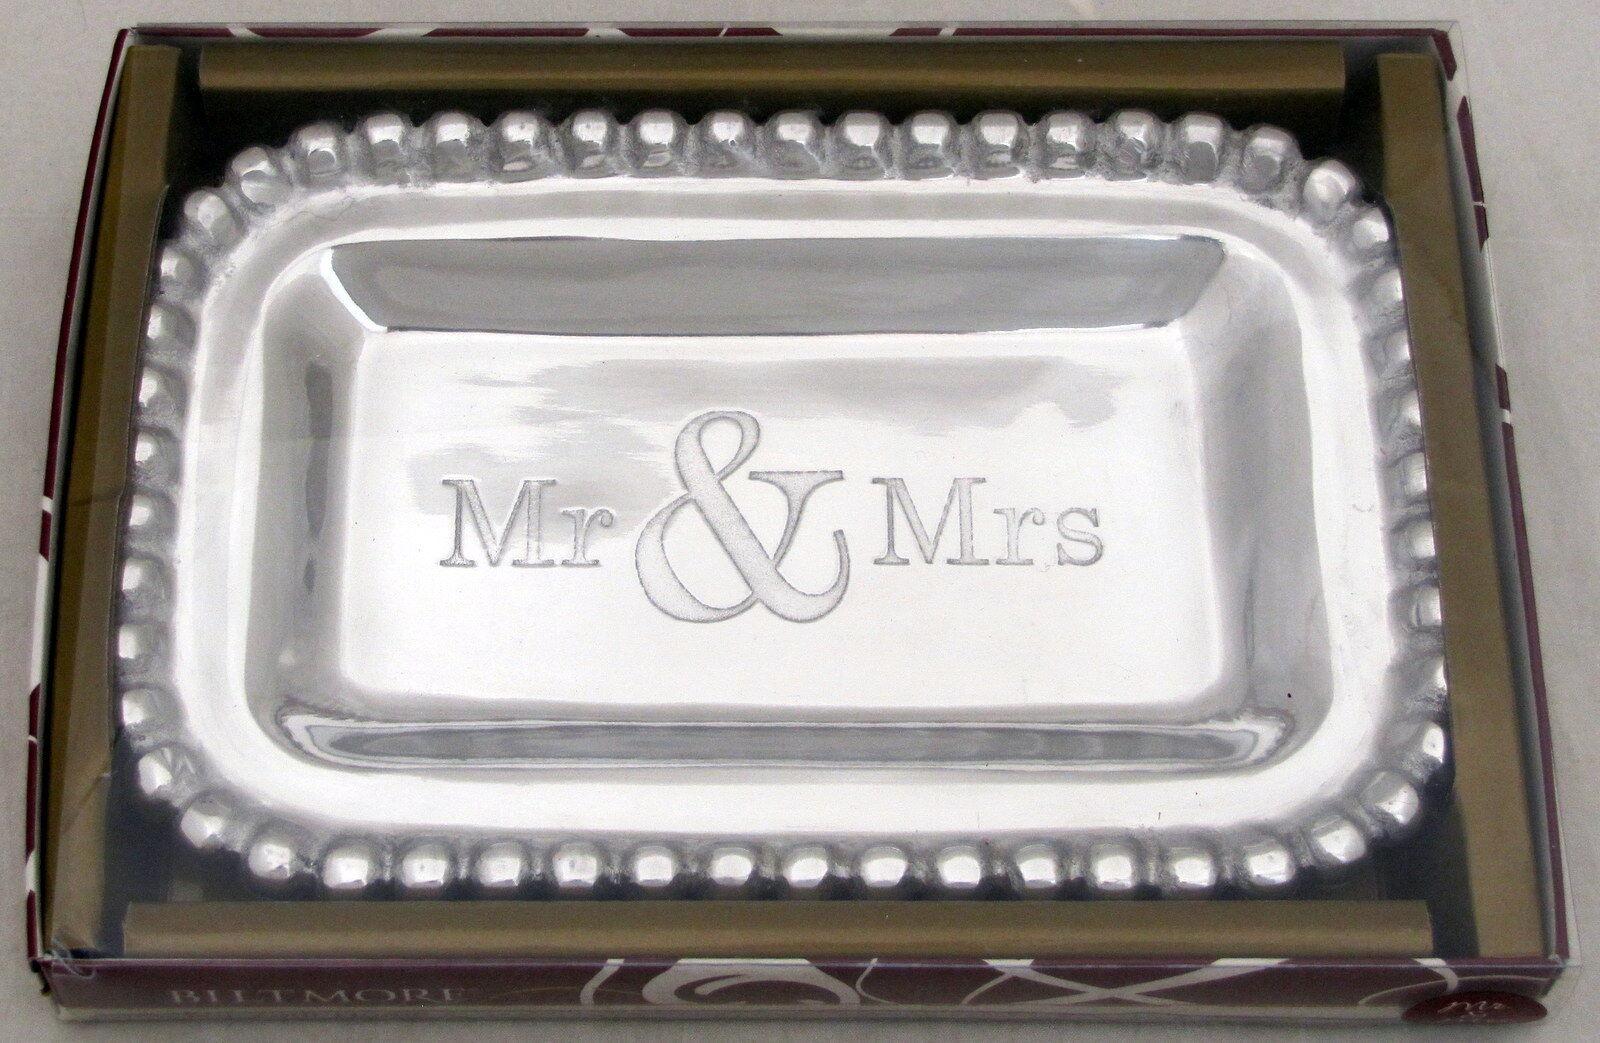 Biltmore Mr Mrs Wedding Decorative Serving Tray Pewter Silver Metal 10 X 6 5 For Sale Online